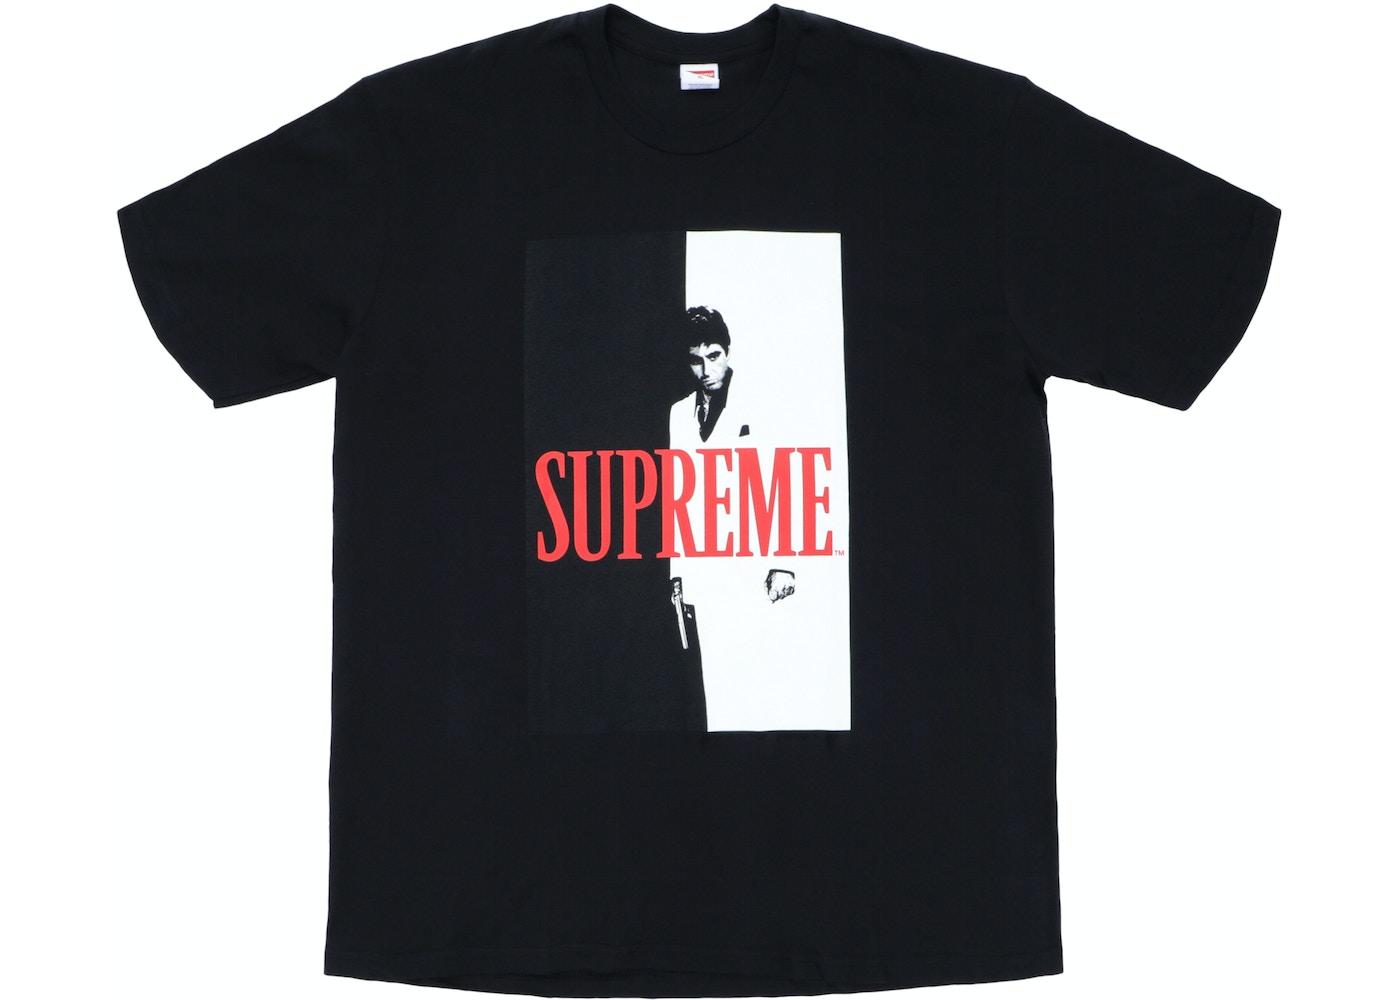 6e771ac871432 Supreme Fall Winter 17 Streetwear